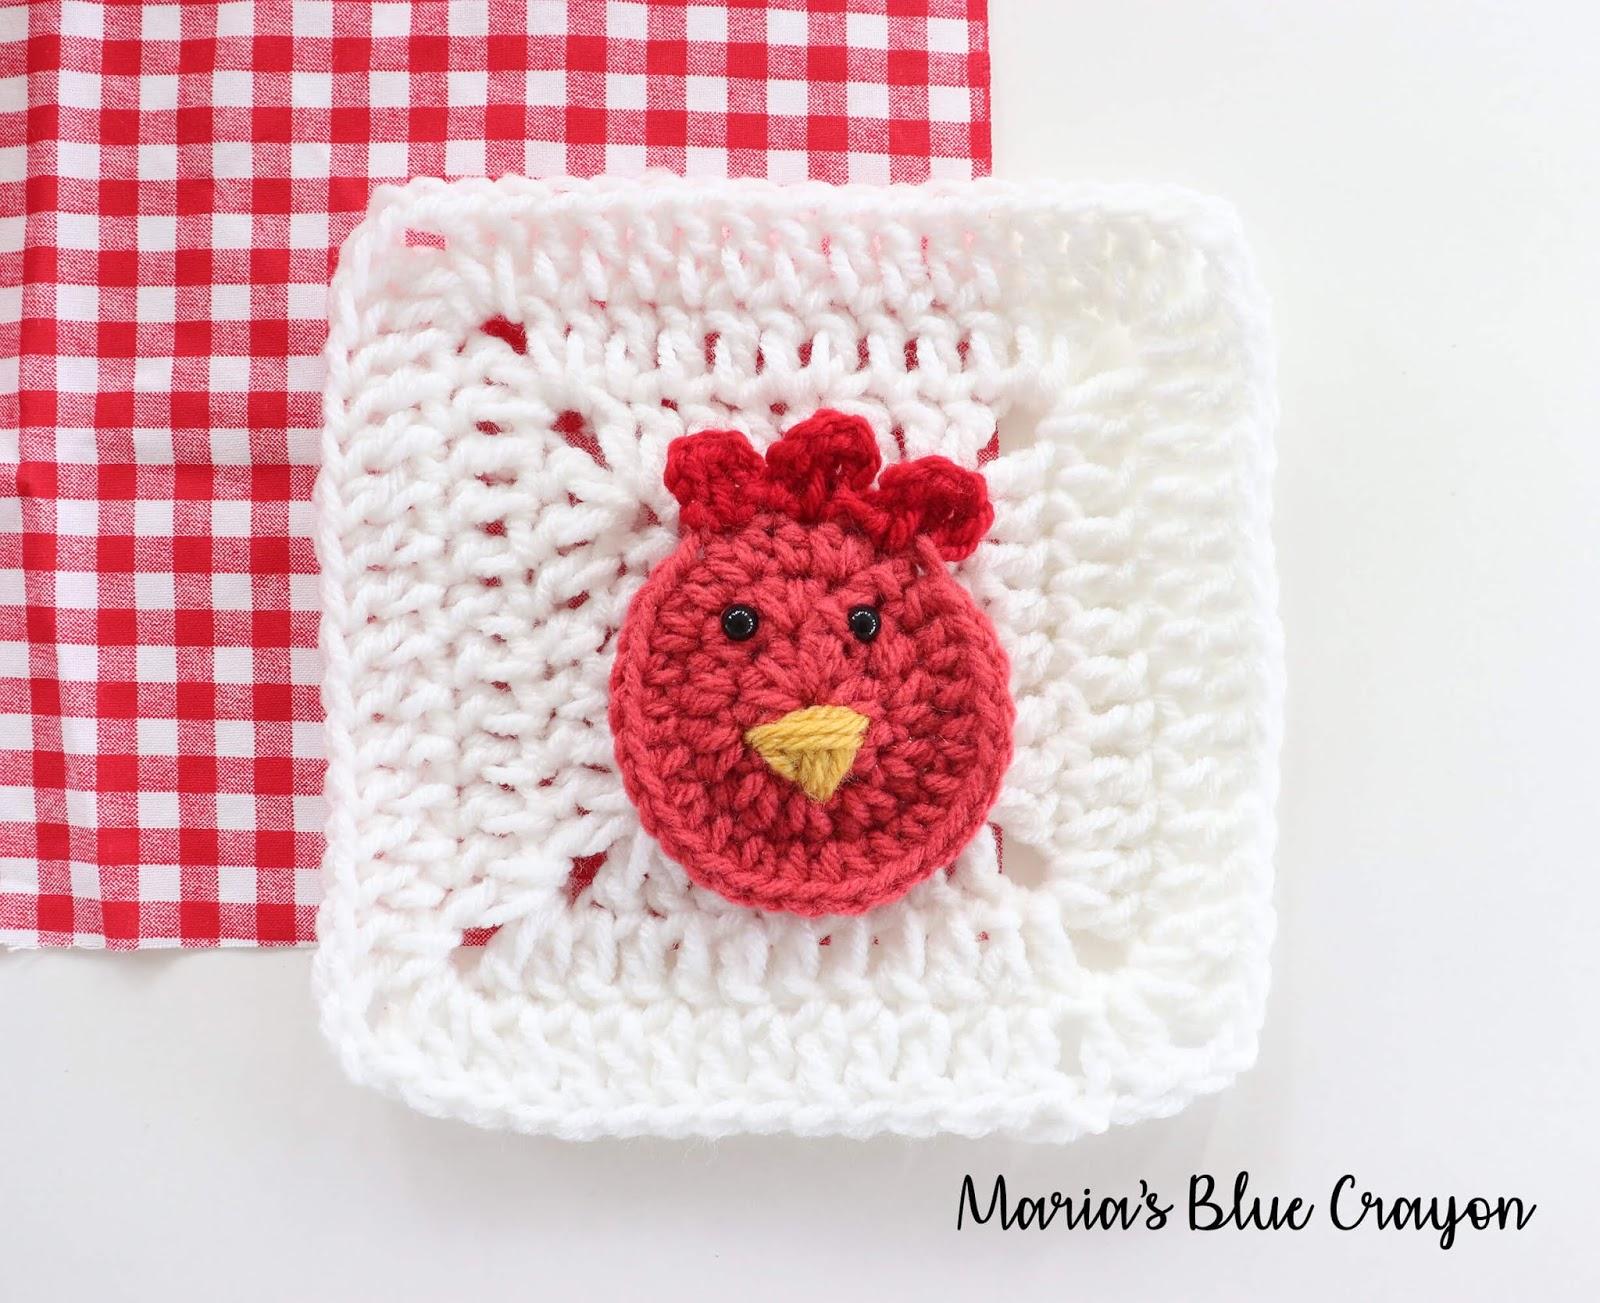 Crochet Rooster Applique Free Crochet Pattern Marias Blue Crayon